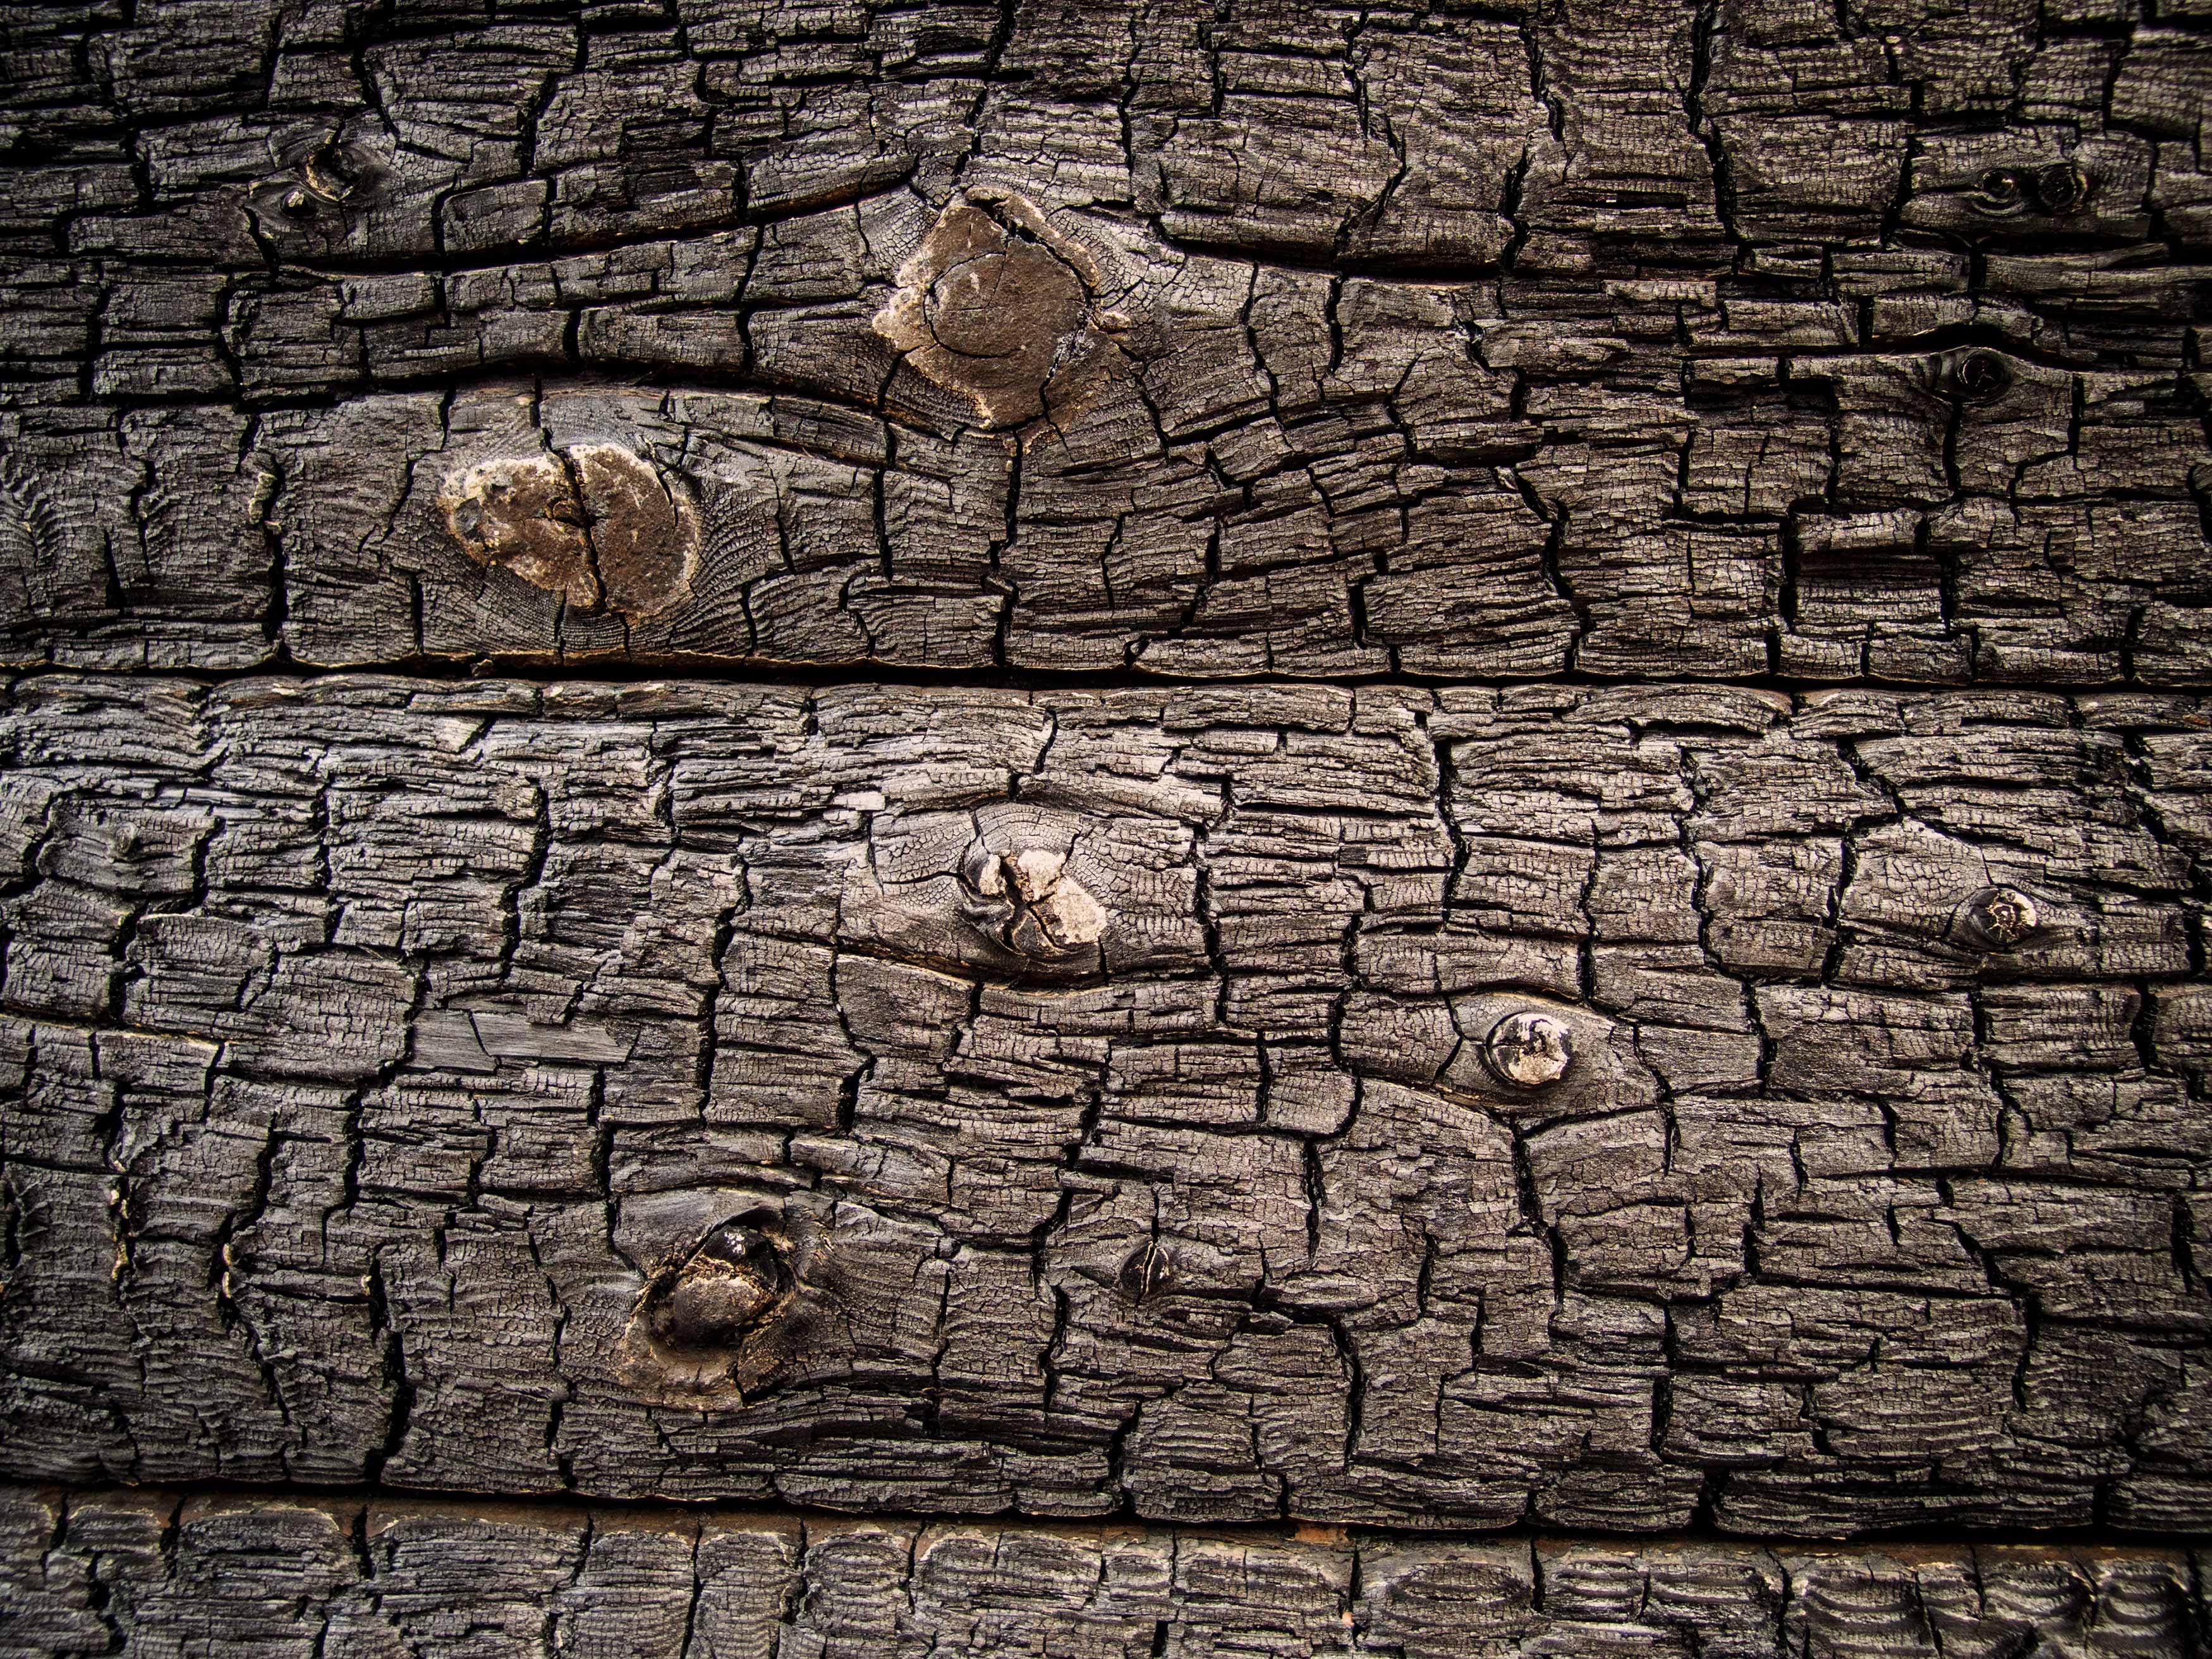 Burnt Wood Texture Free Stock Photos Libreshot